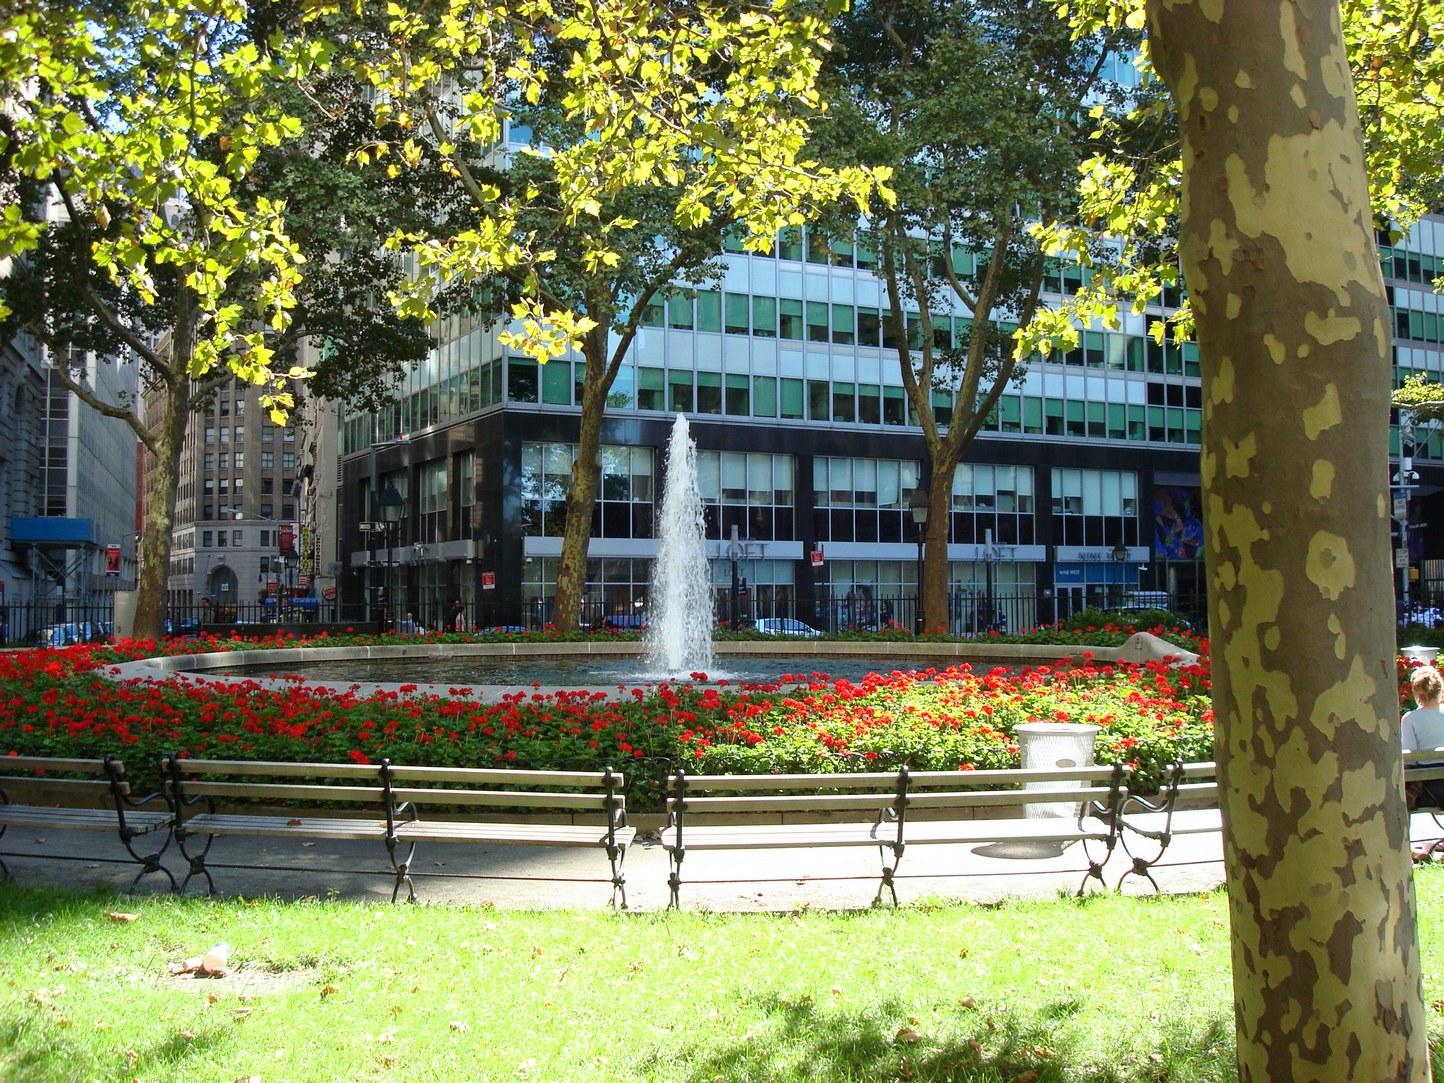 New York City_LowerManhattan_GorgeousBatteryPark